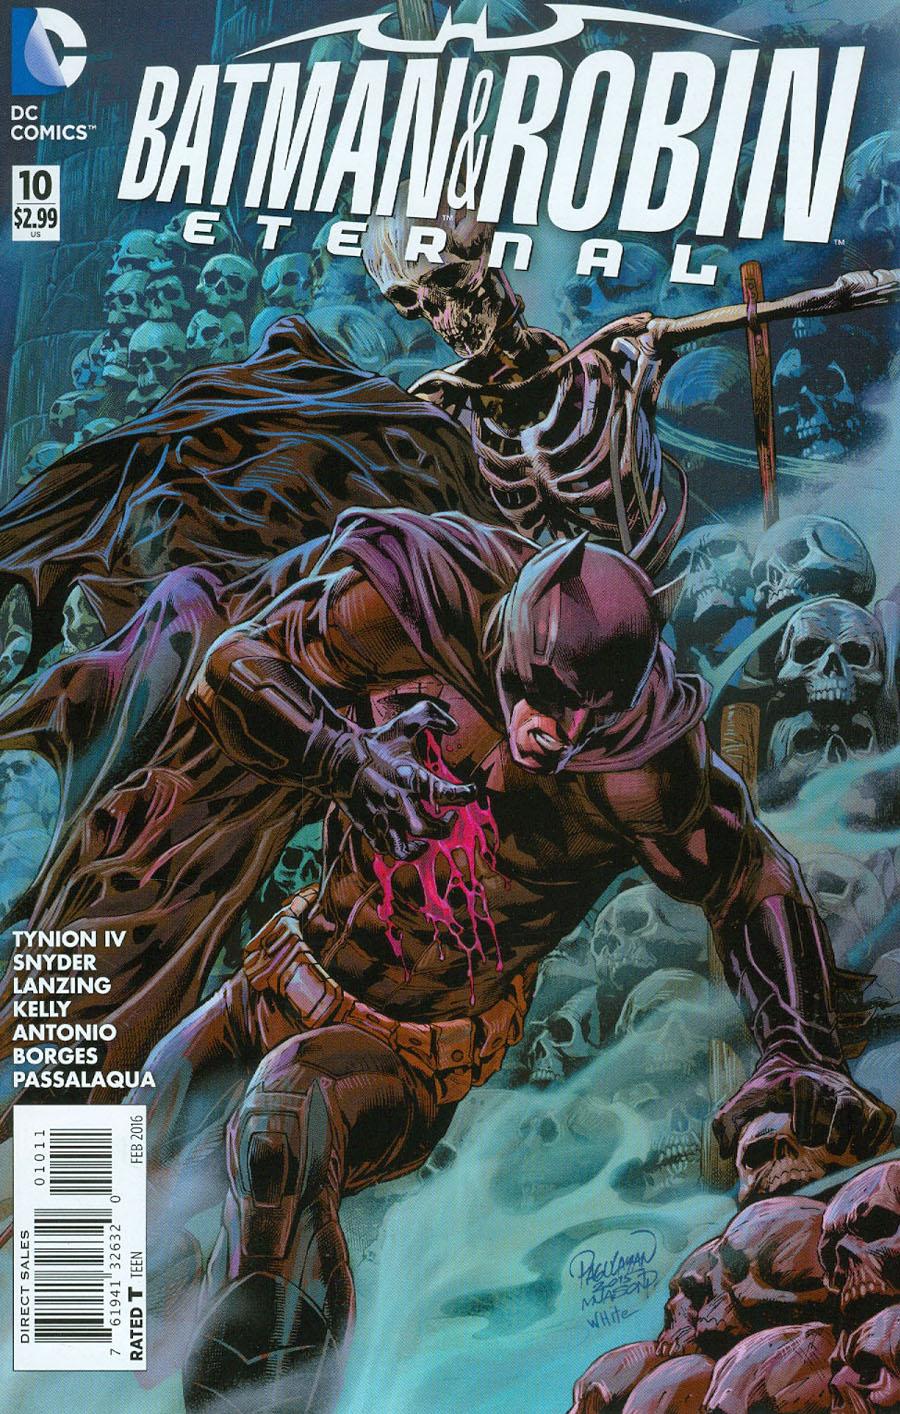 Batman And Robin Eternal #10